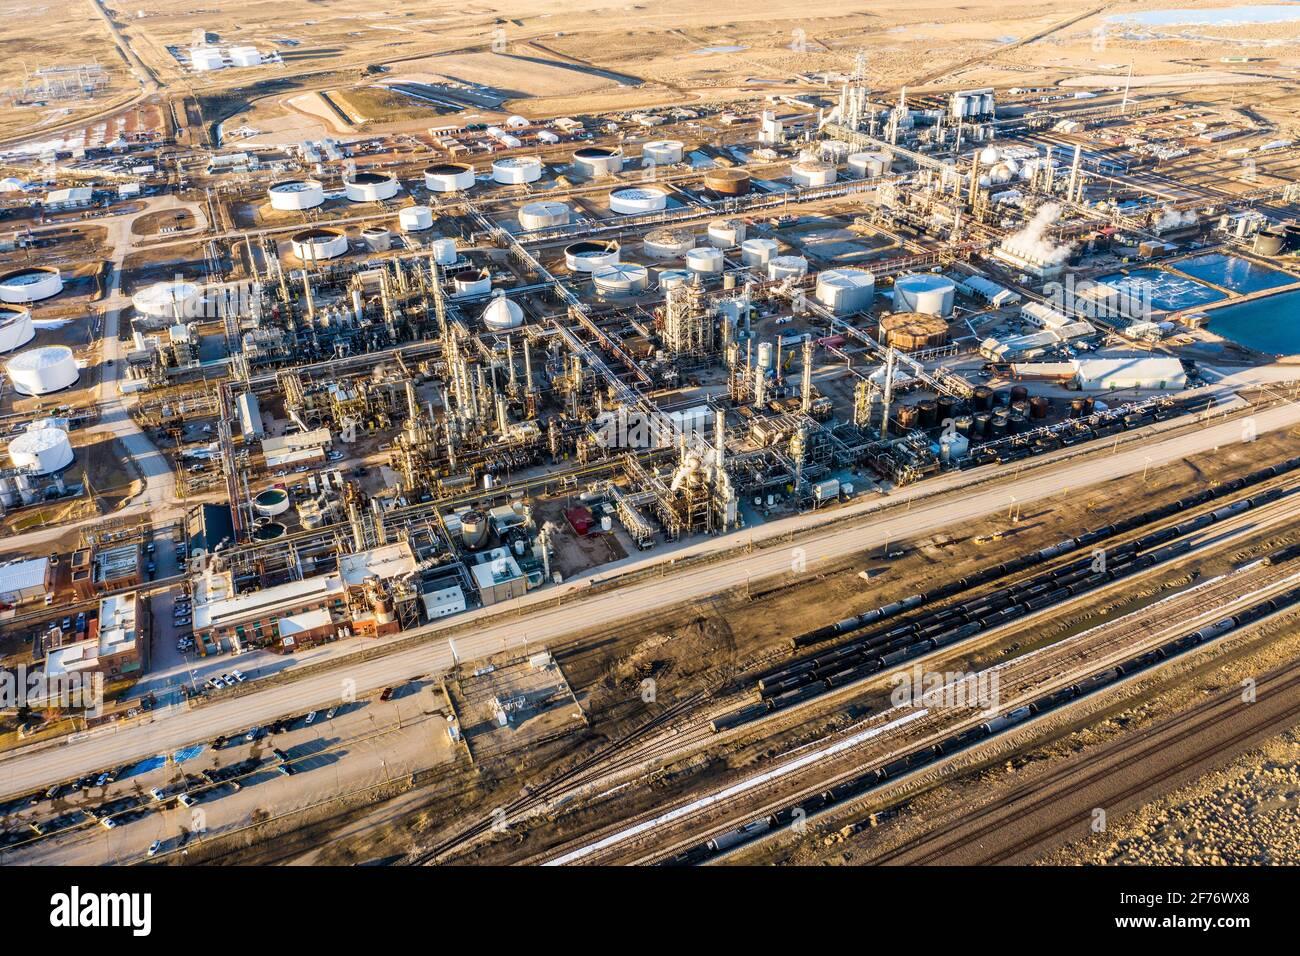 Sinclair Oil Refinery, Sinclair, Wyoming, USA Stock Photo